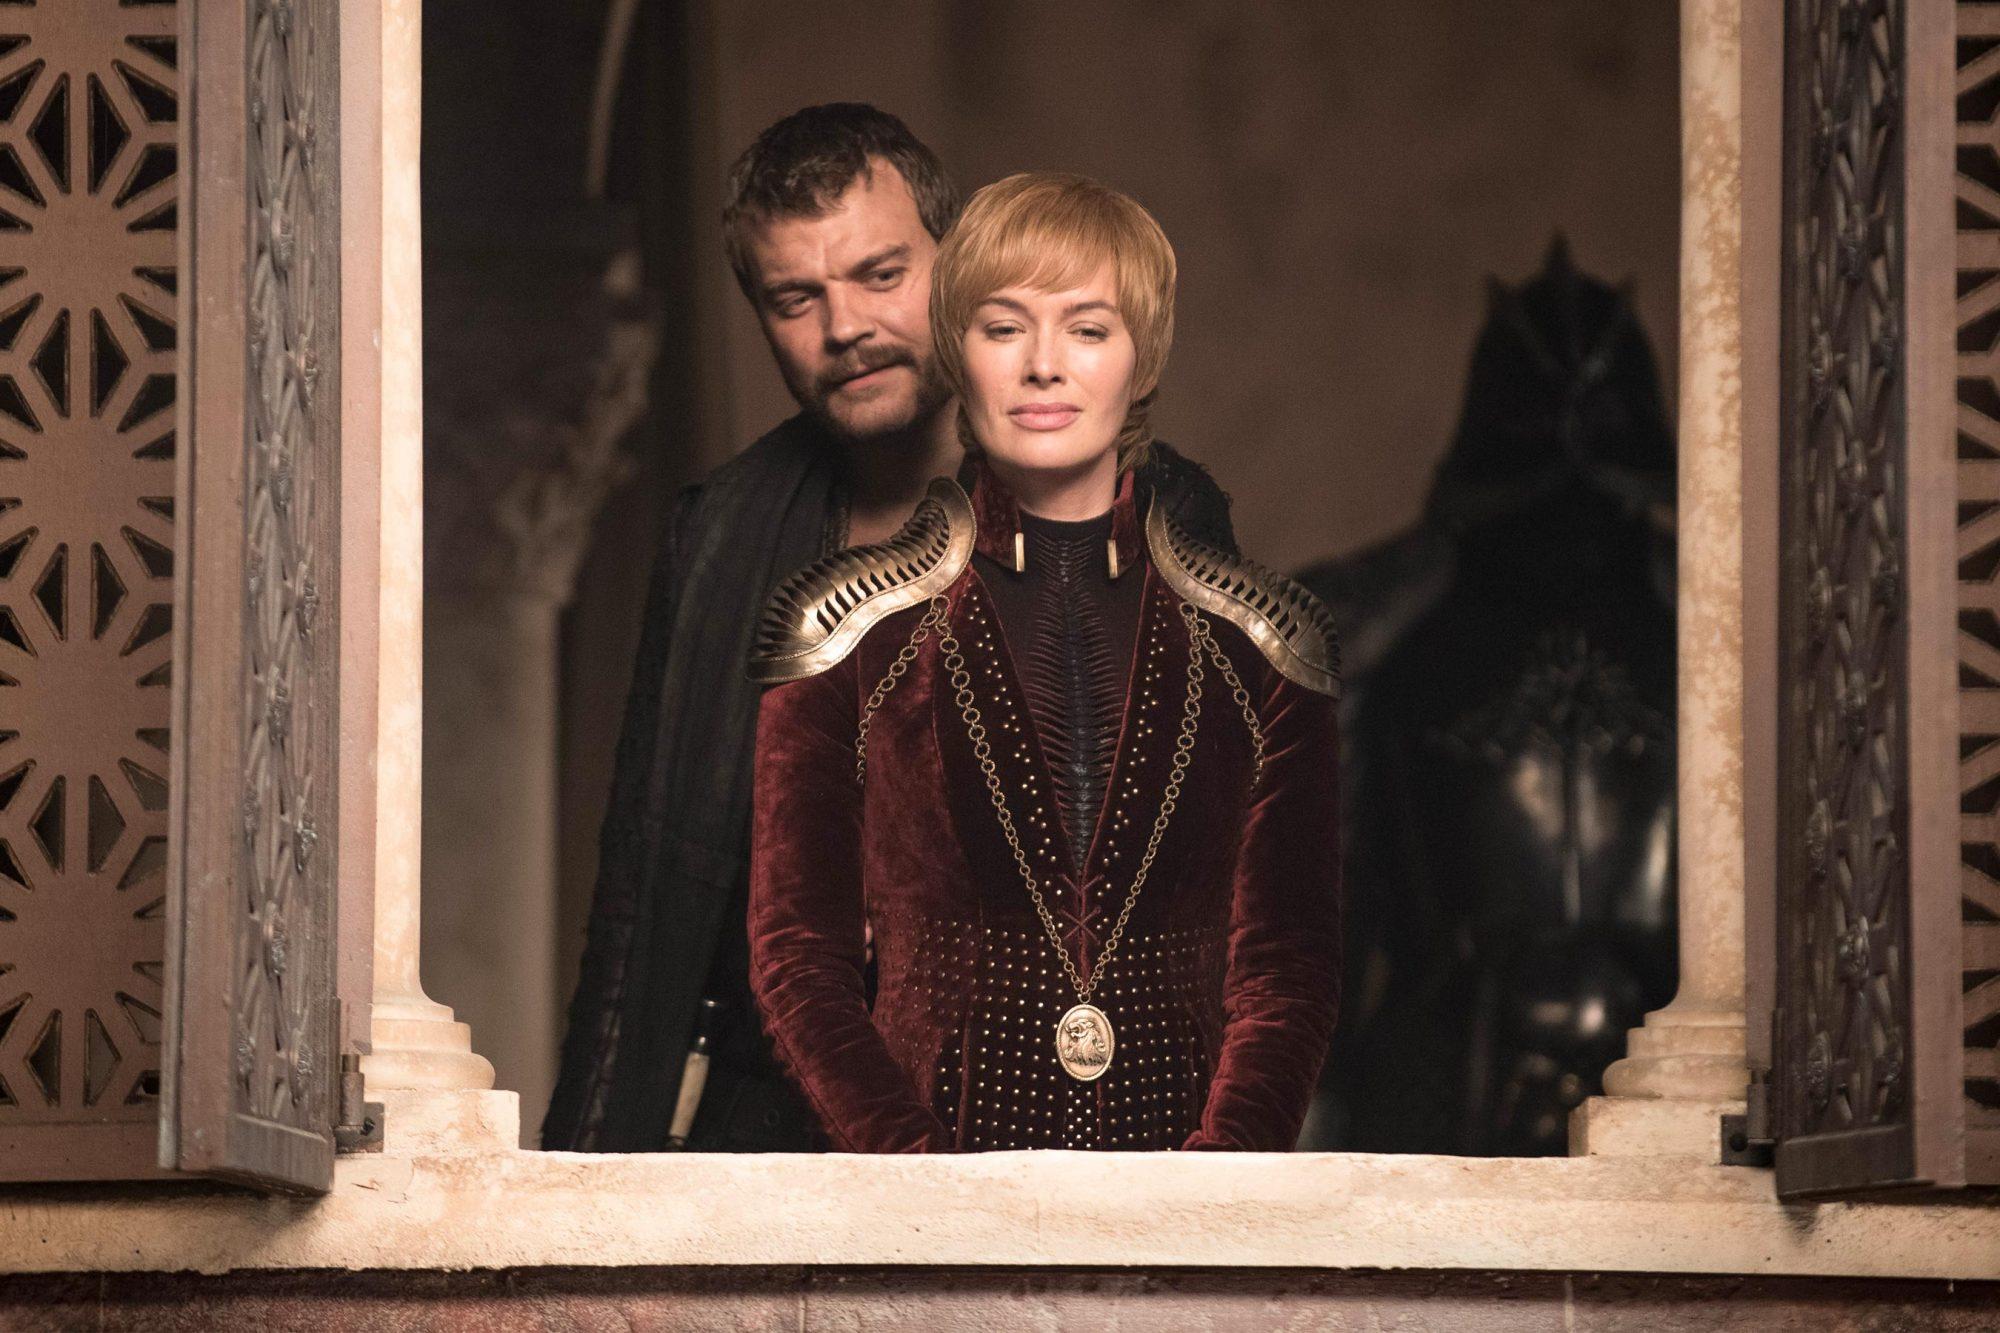 Game of Thrones Season 8, Episode 4 (L to R) Pilou Asbæk as Euron Greyjoy and Lena Headey as Cersei Lannister - Photo: Helen Sloan/HBO